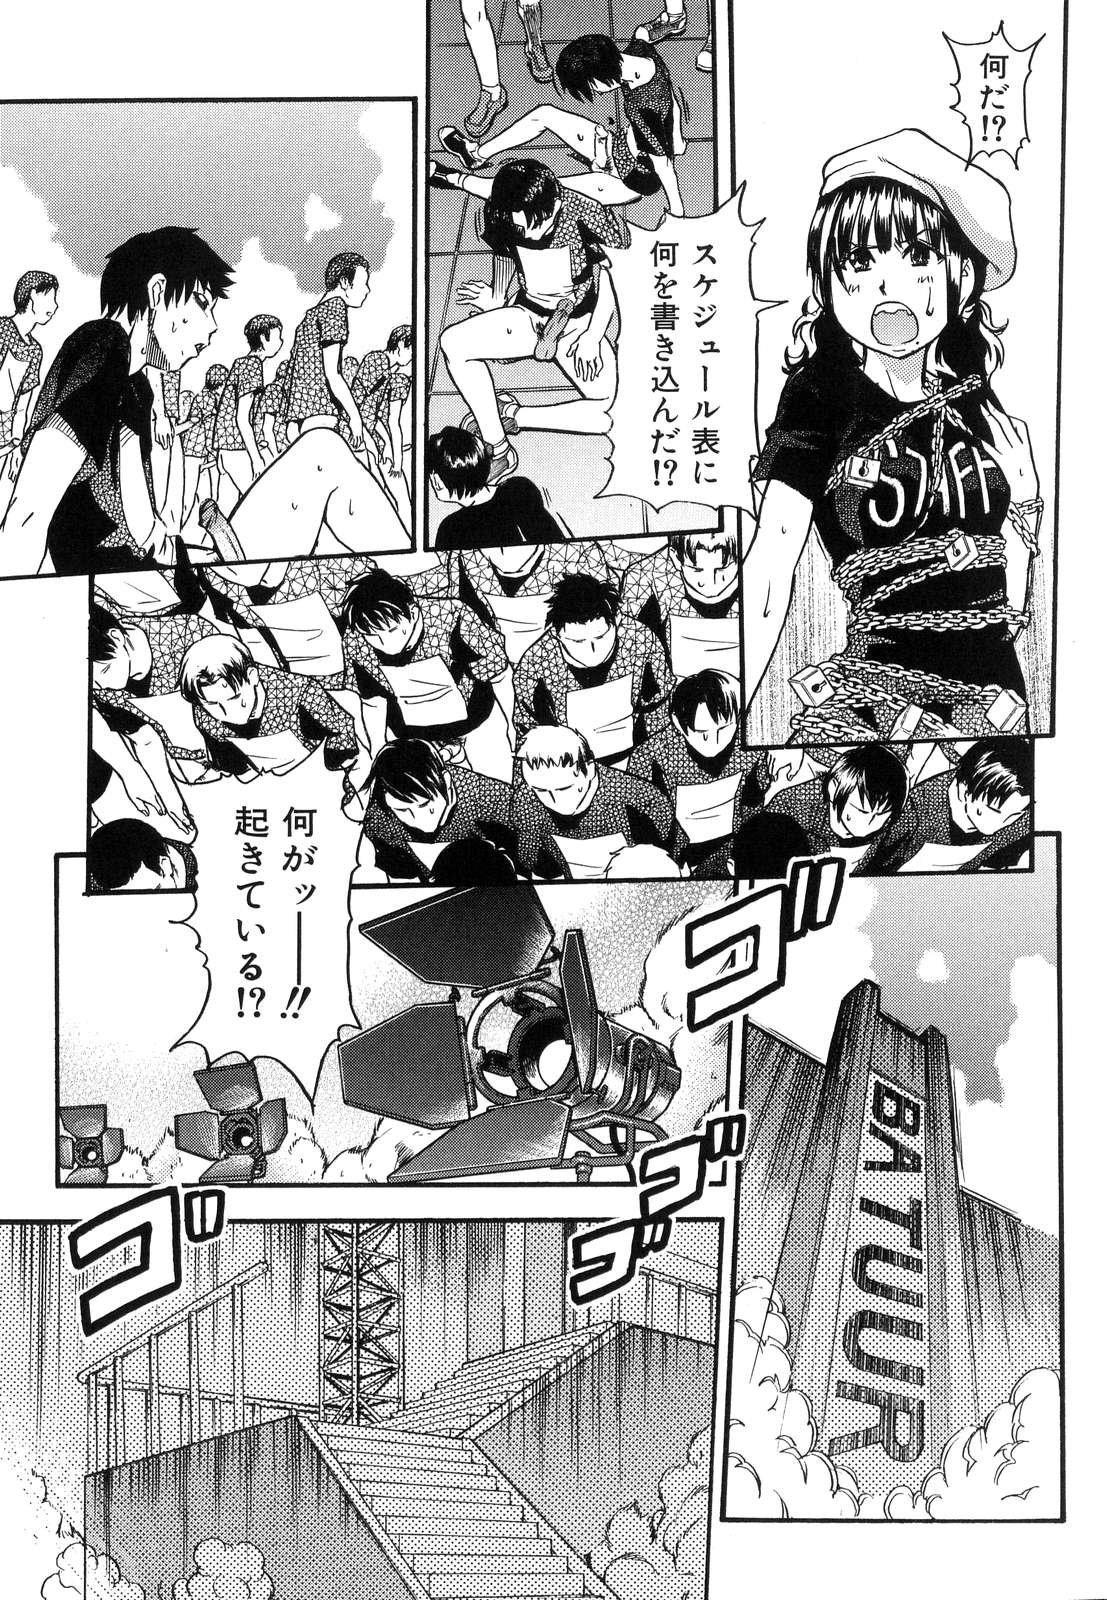 Shining Musume. 6. Rainbow Six 168